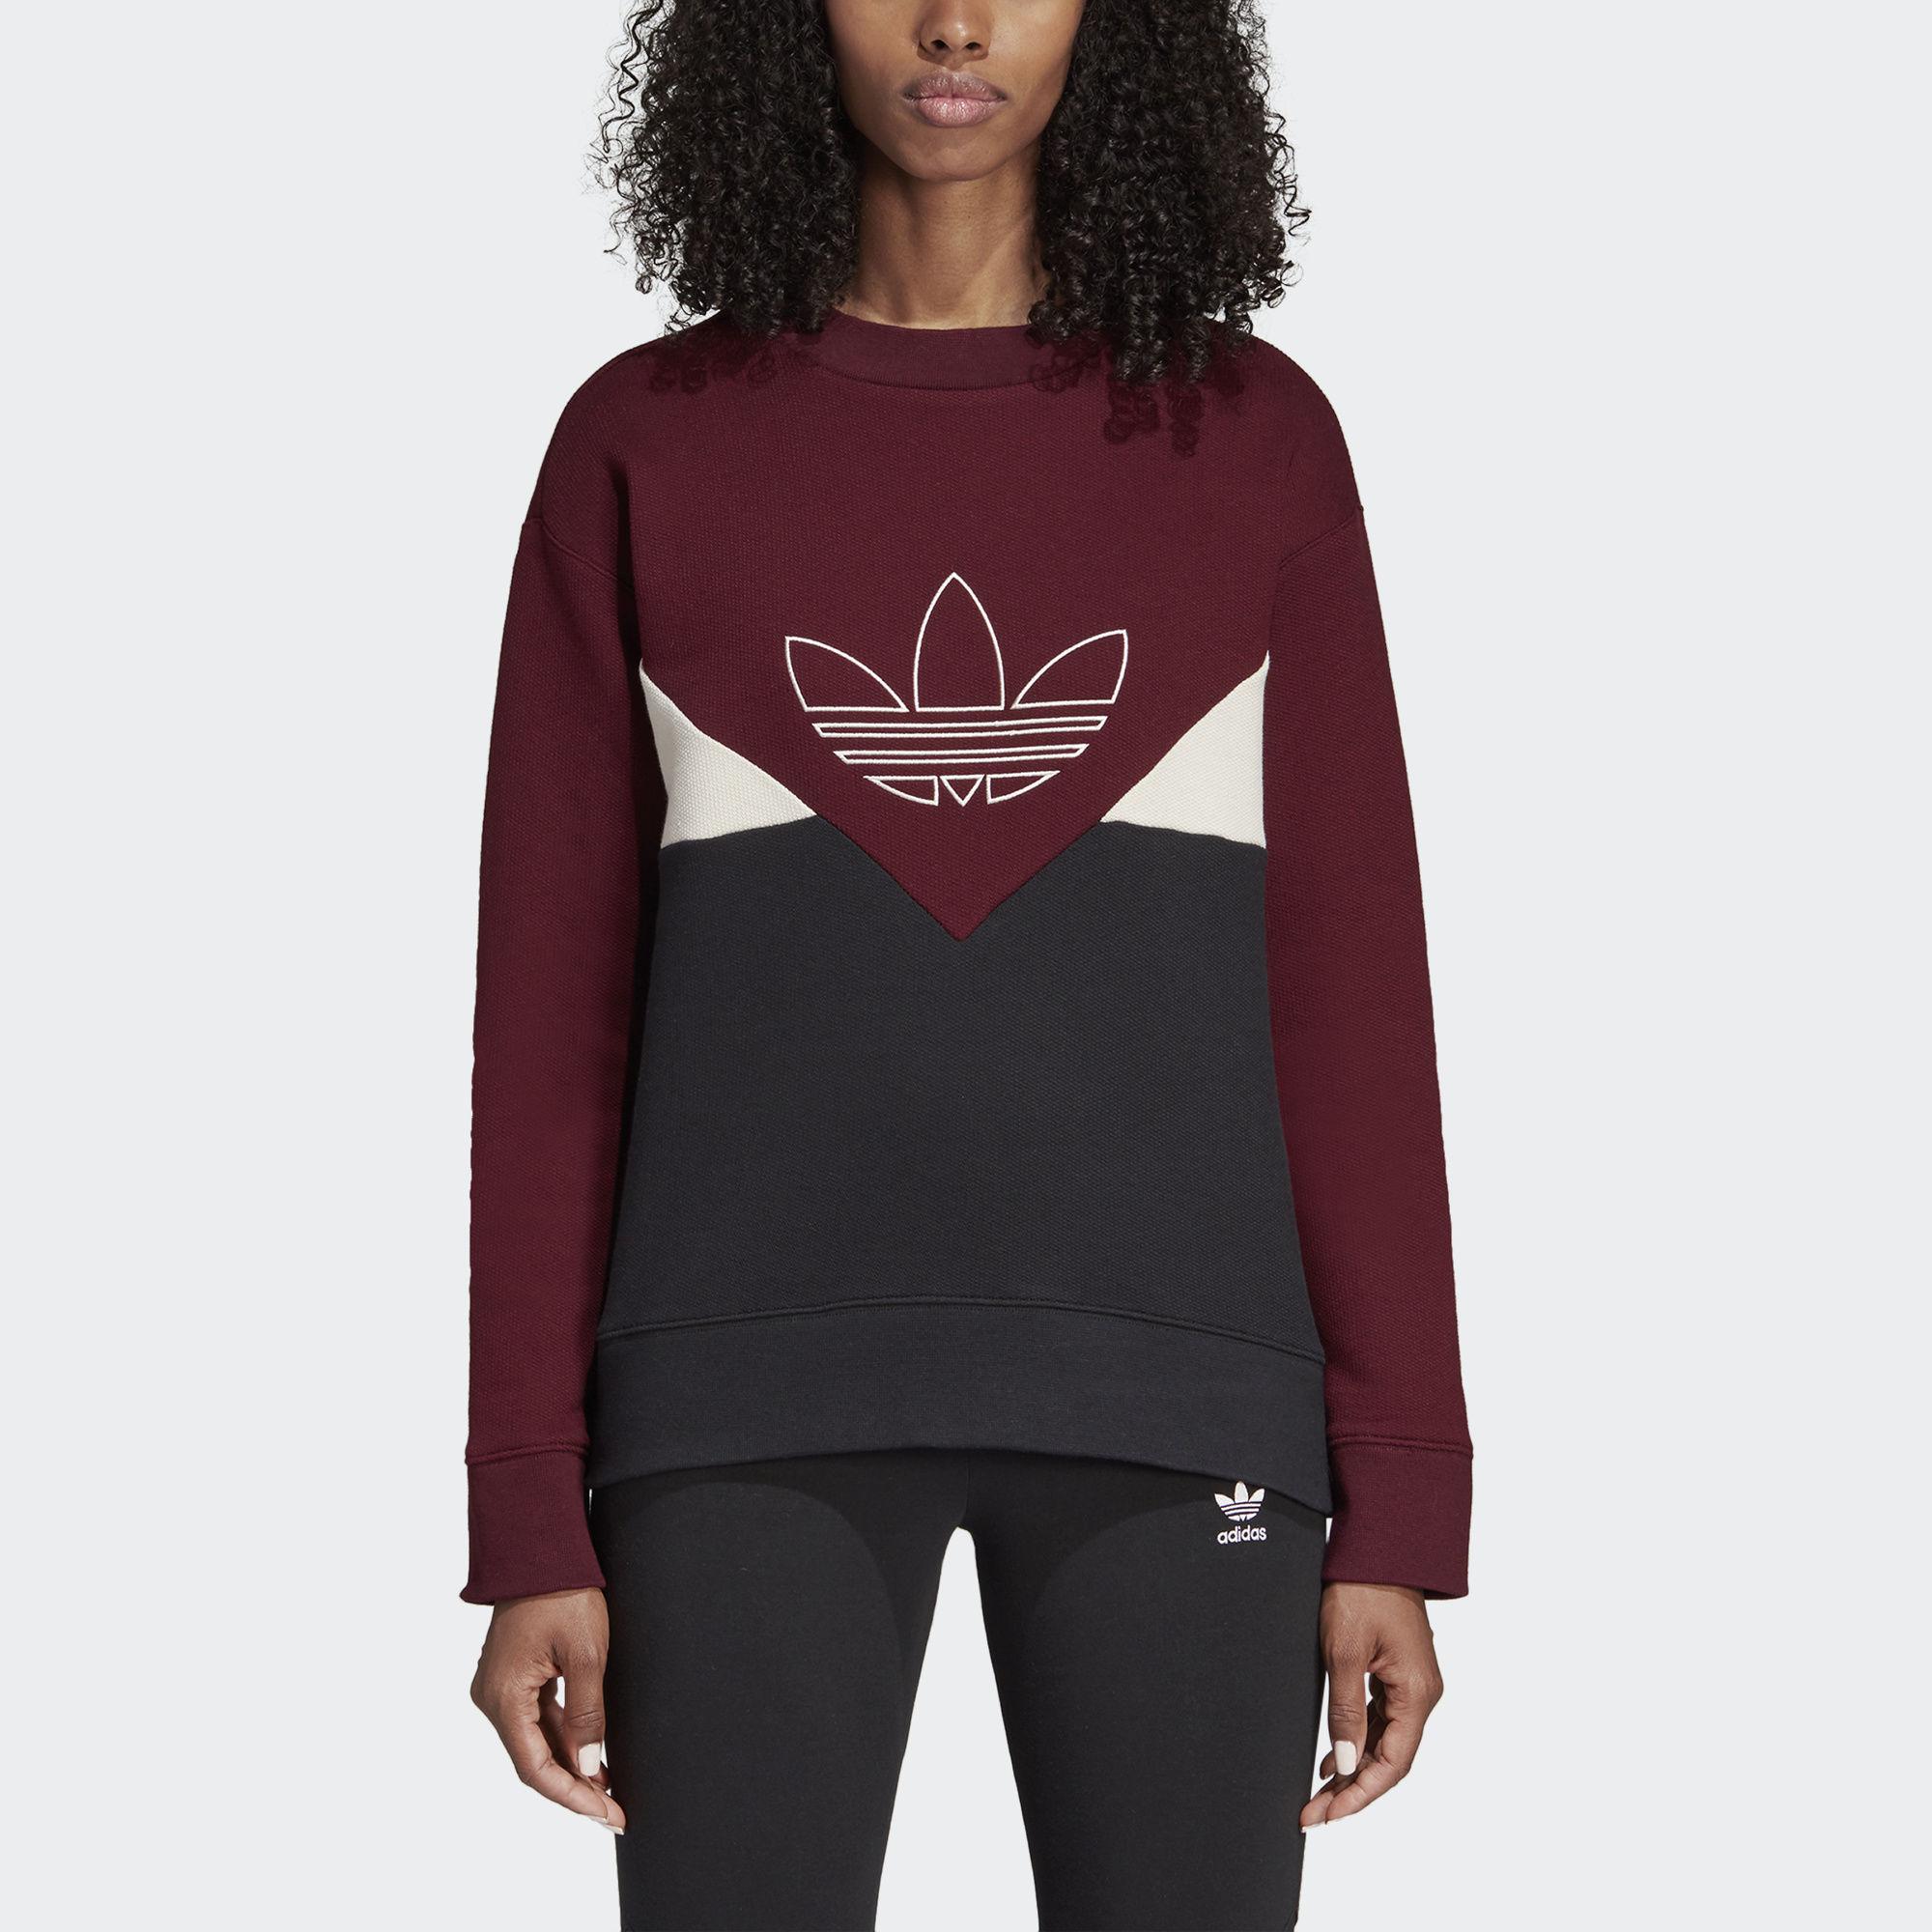 clrdo adidas sweatshirt